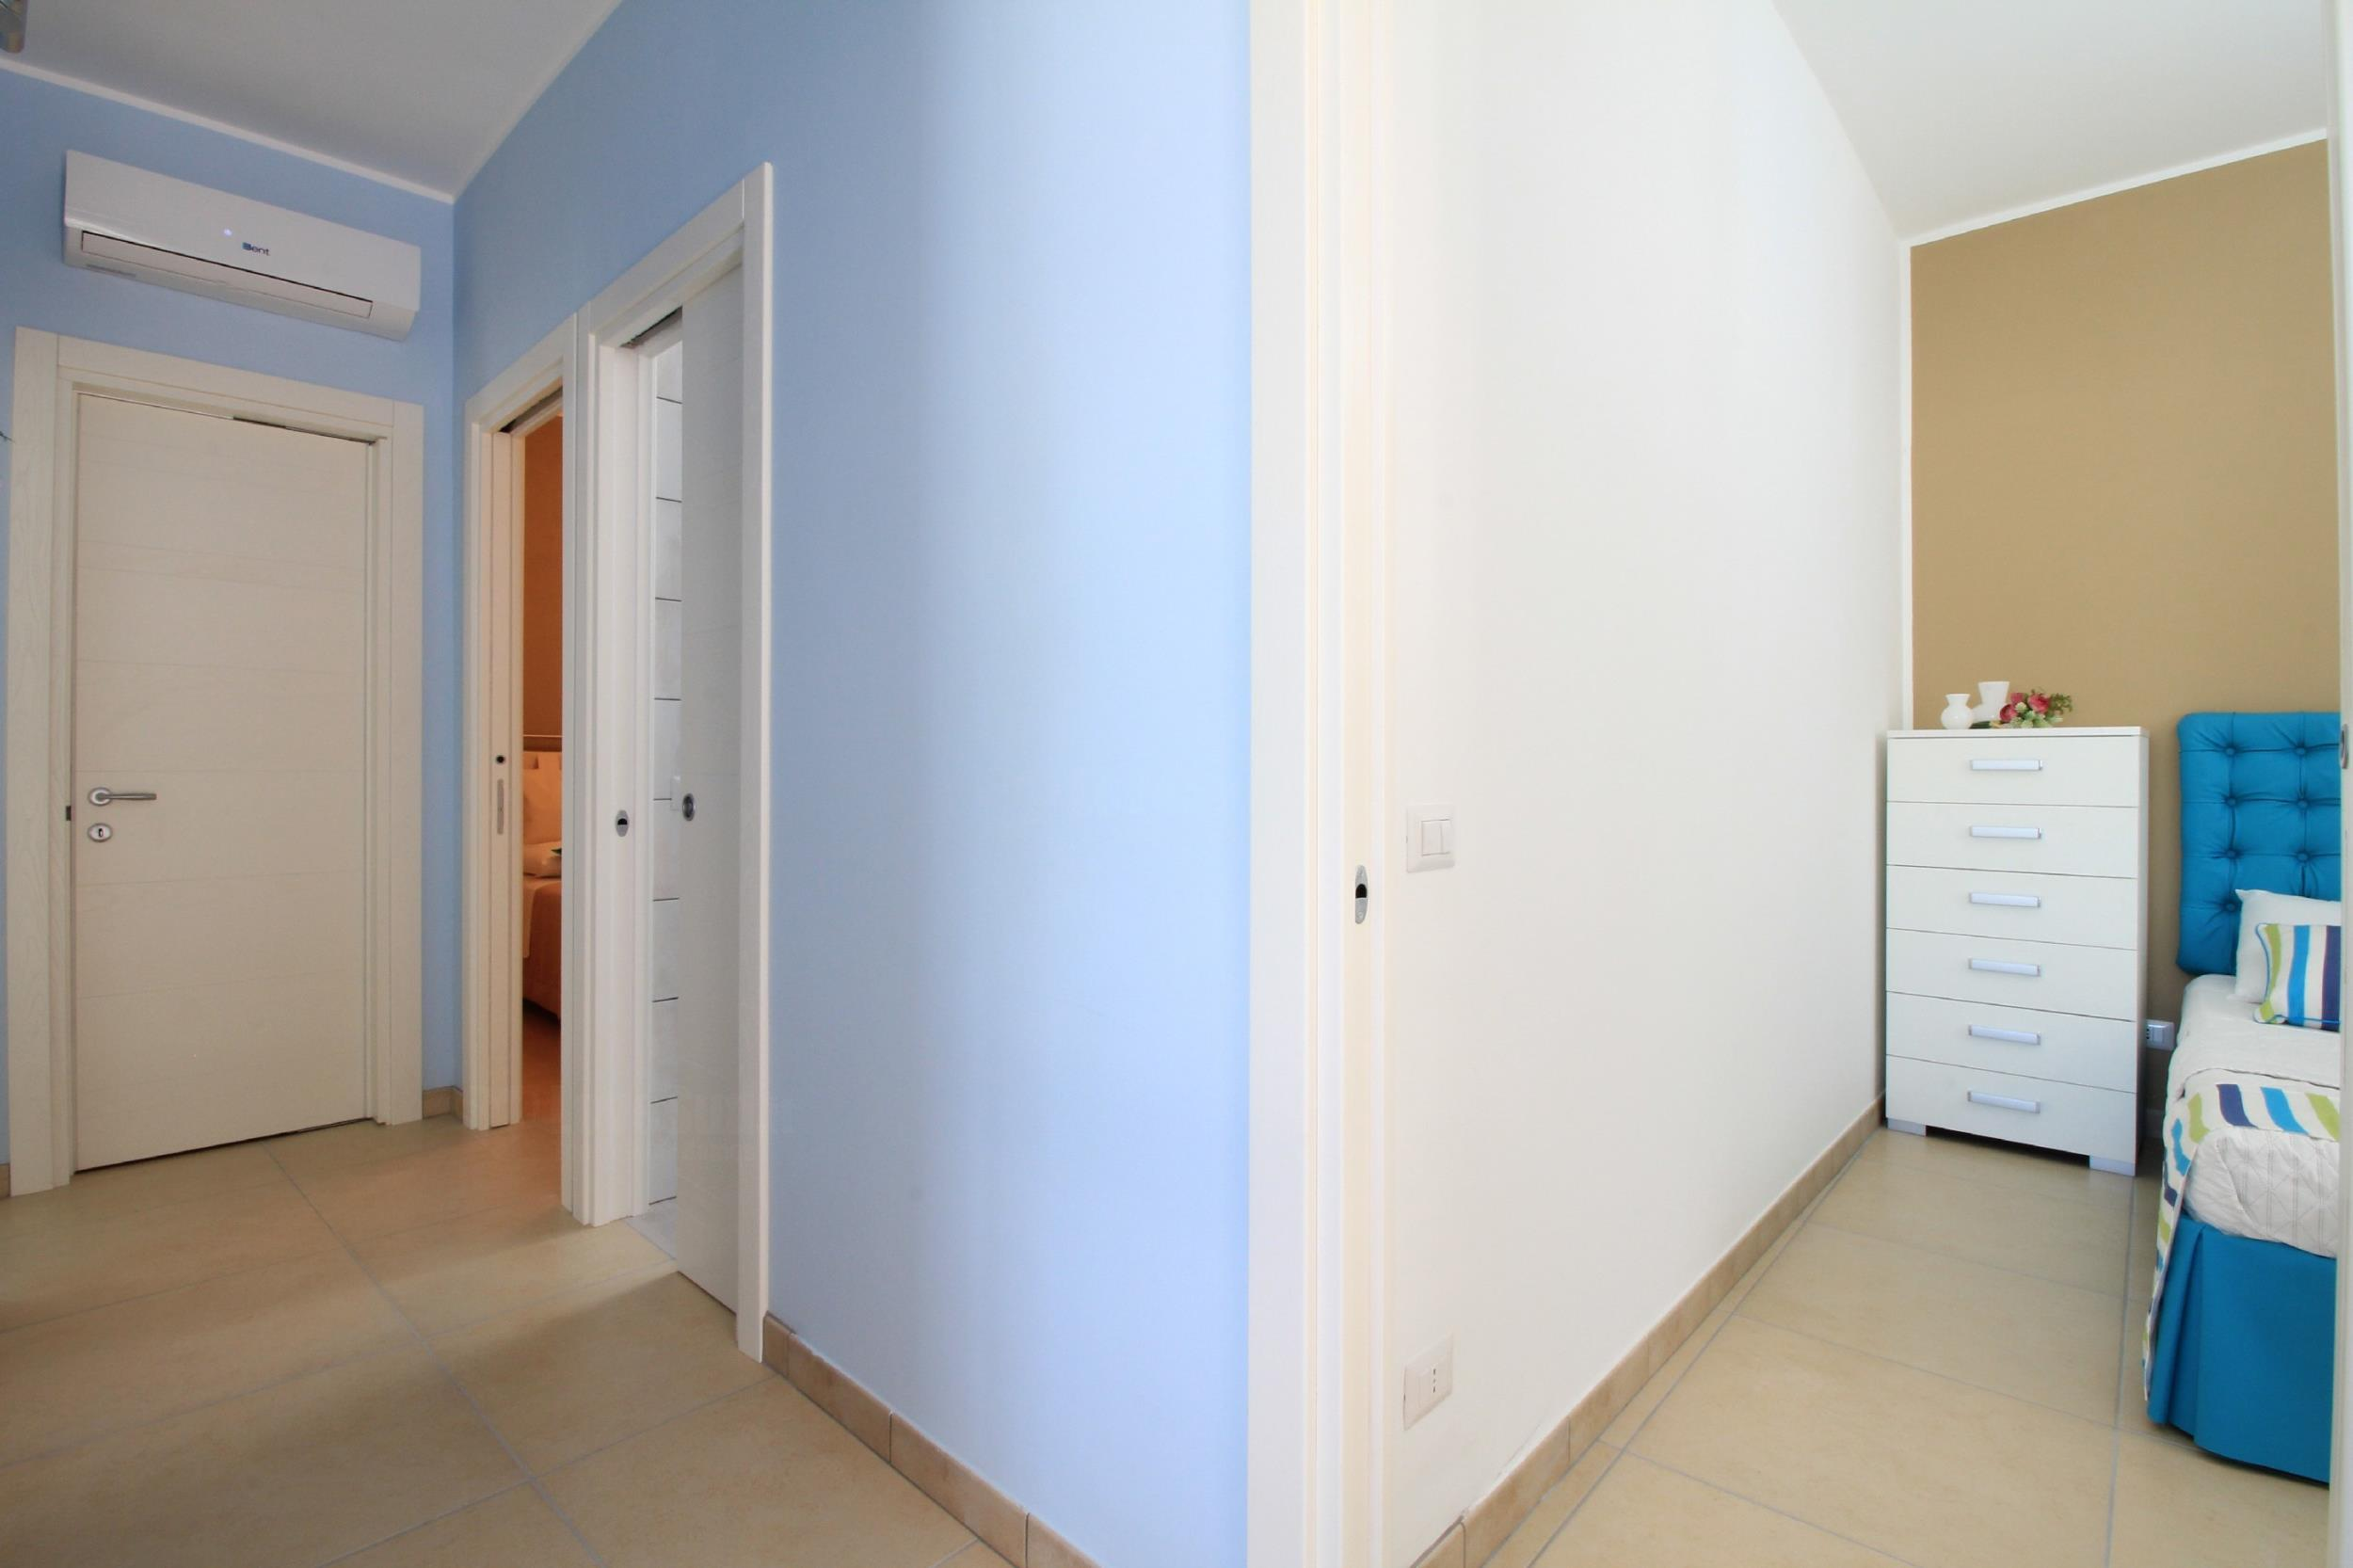 Apartment Elcisia luxe beach house photo 23457103